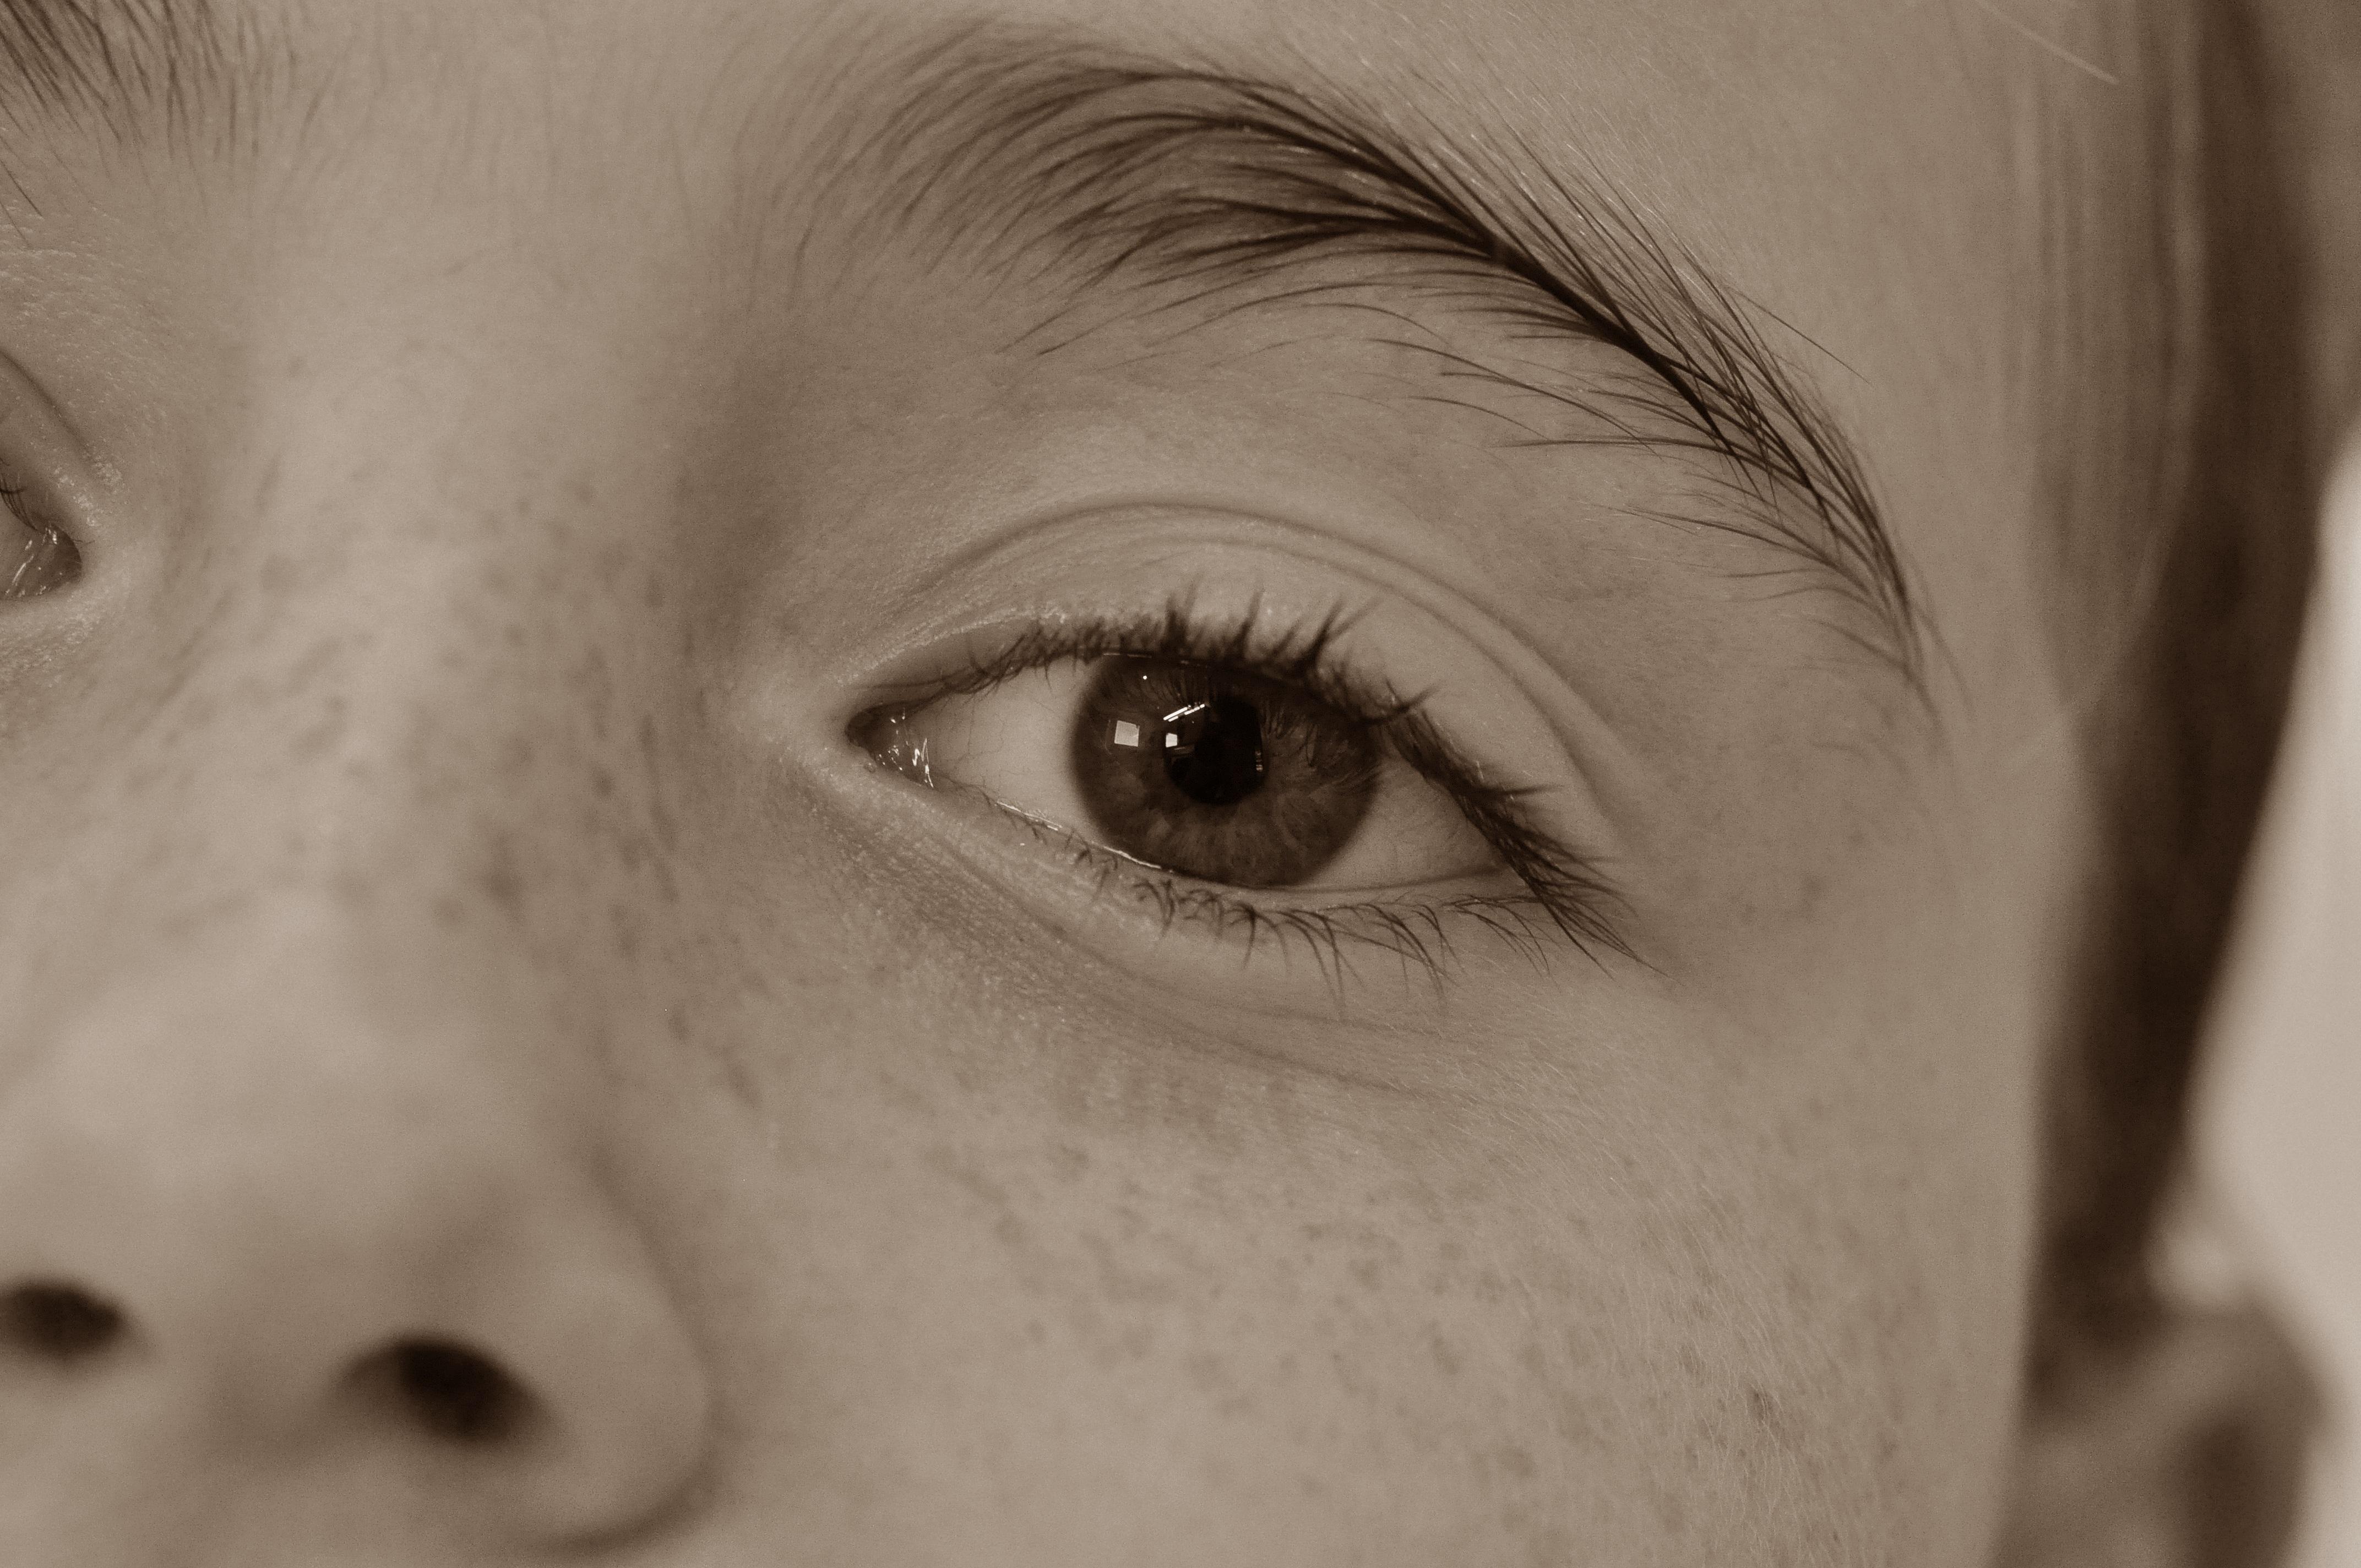 Prosti črno-belo, punca, fotografija-5057